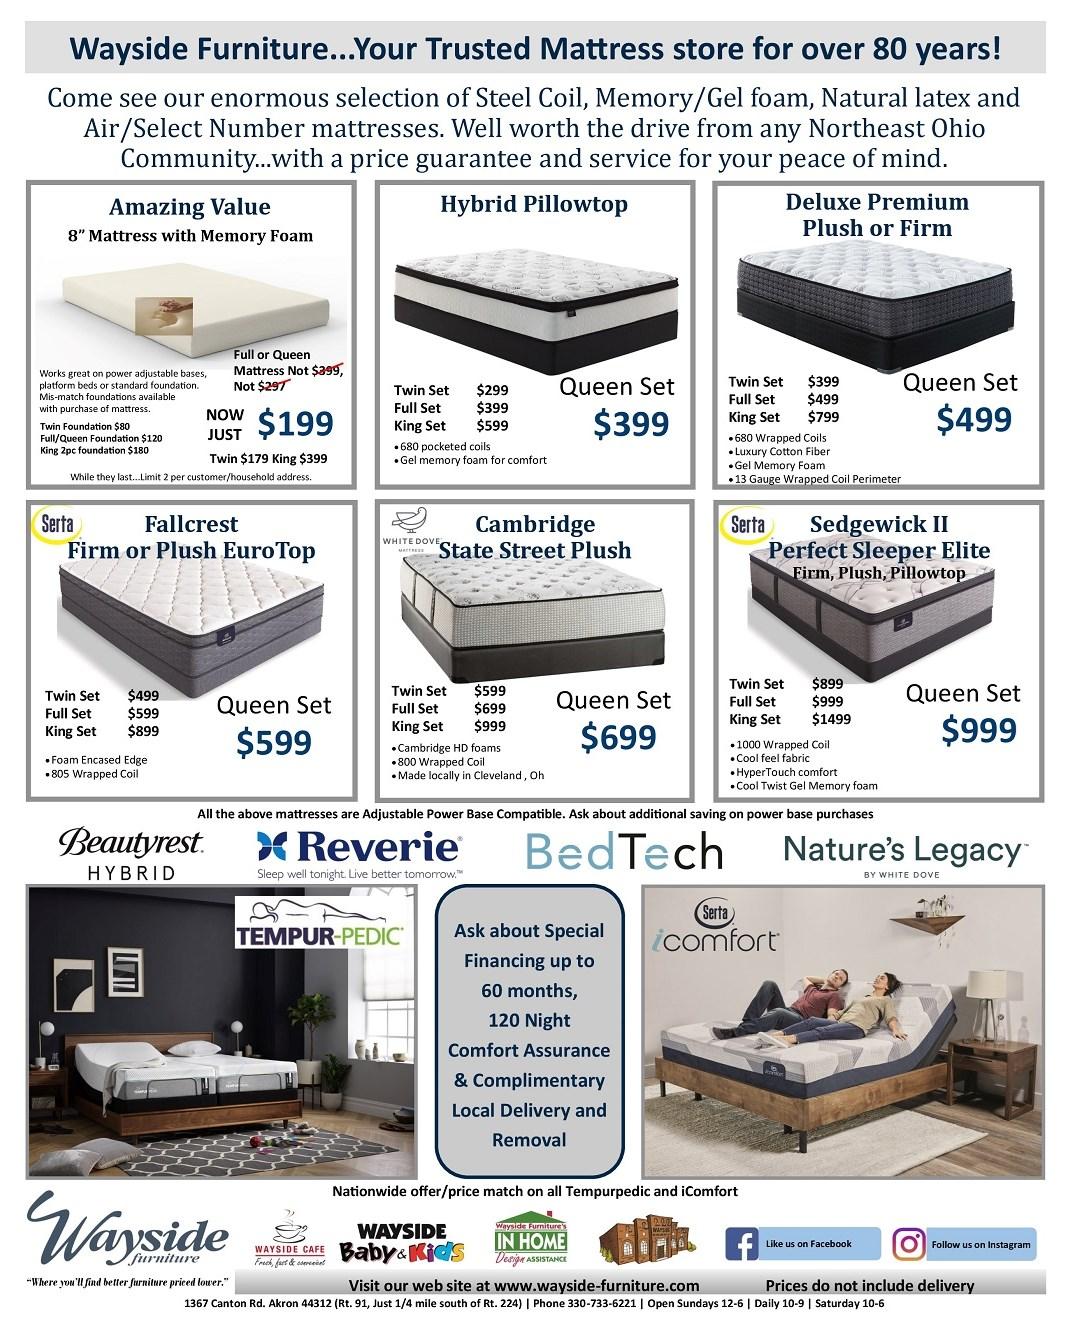 Serta, White Dove, Beautyrest, Tempurpedic, icomfort, nature's legacy, foam mattress, latex mattress, gel memory foam, firm, plush, pillowtop, Reverie adjustable base